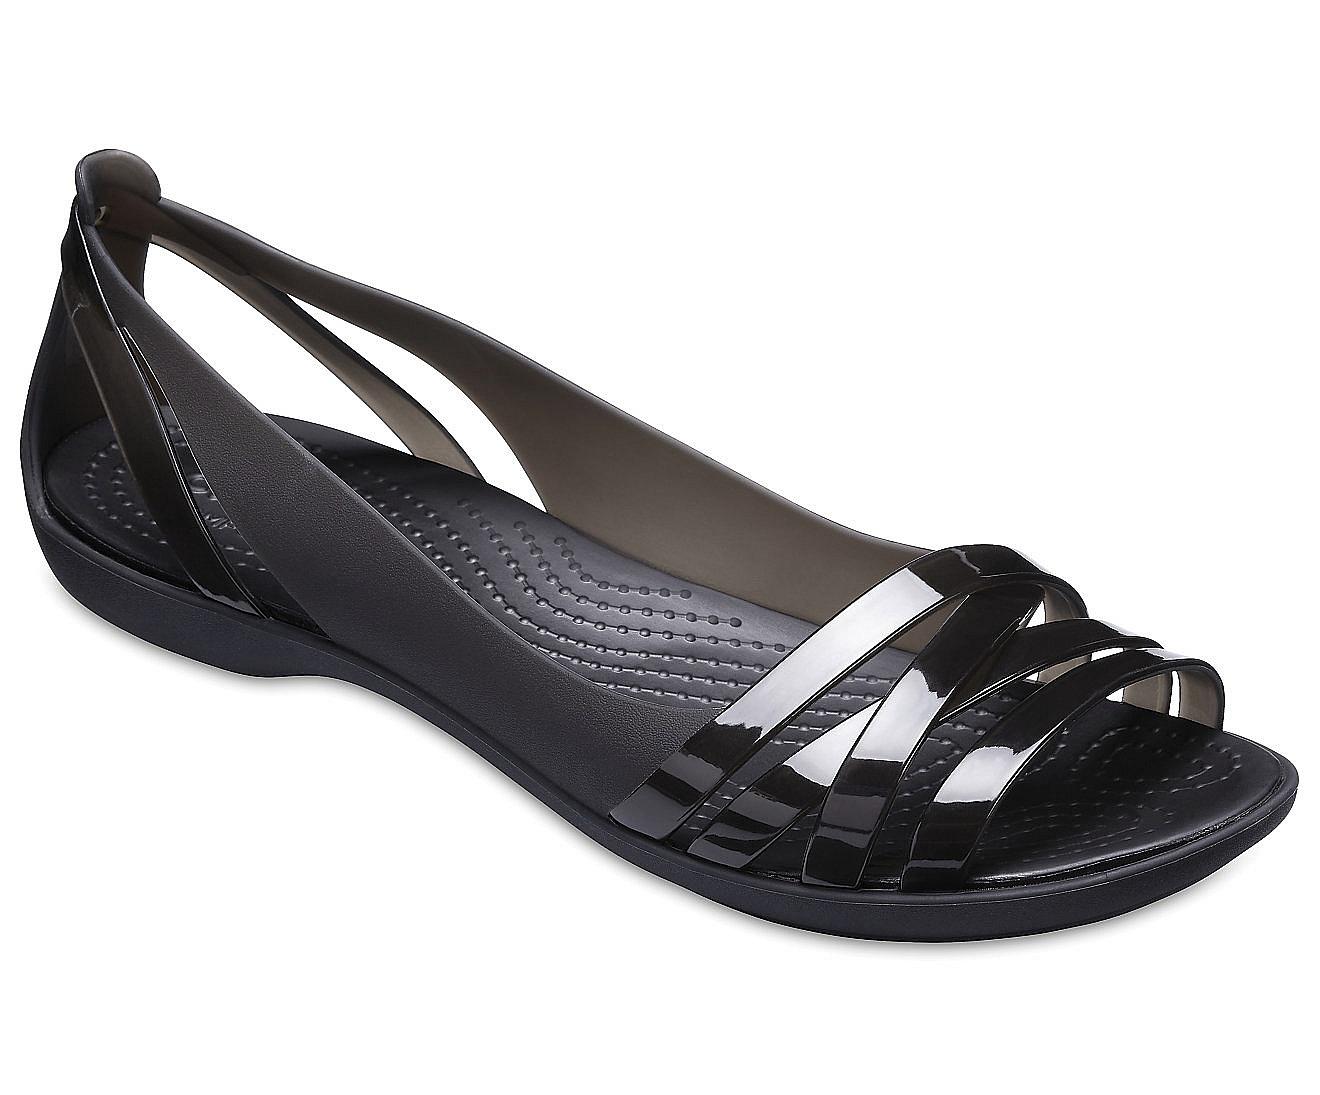 ccccffe8609 boty Crocs Isabella Huarache 2 Flat - Black Black 36 37